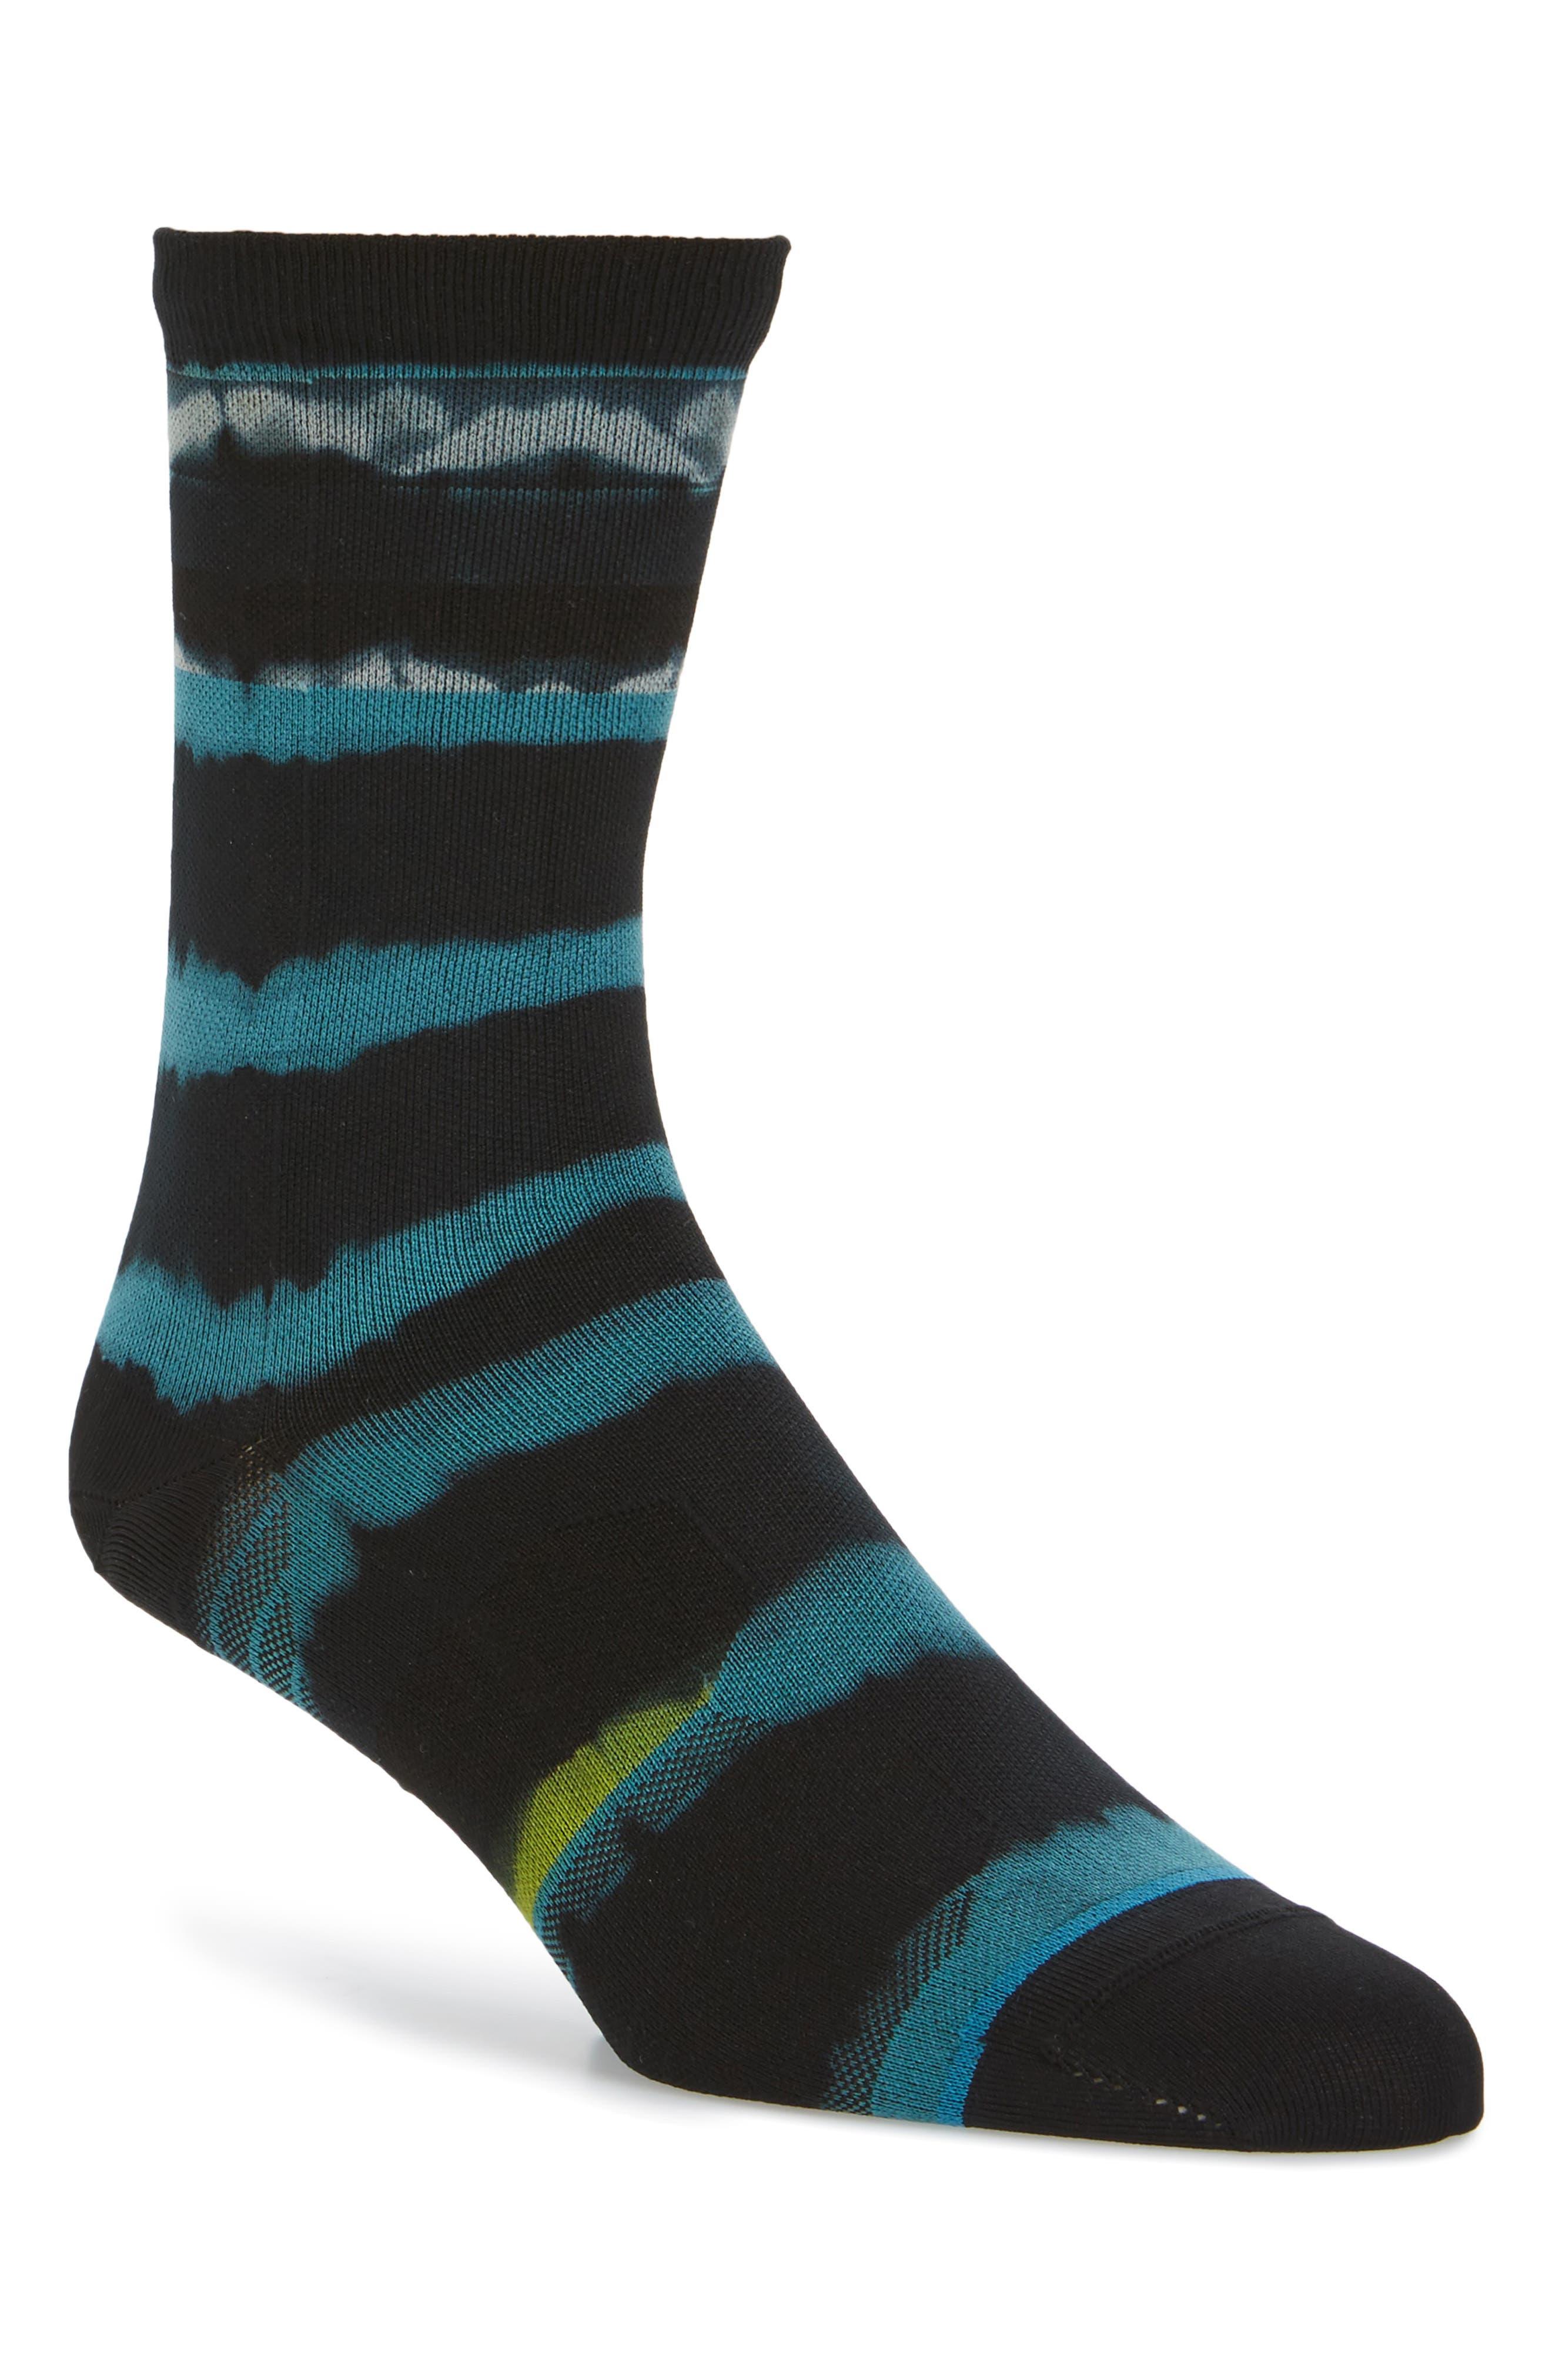 Alternate Image 1 Selected - Stance Empower Crew Socks